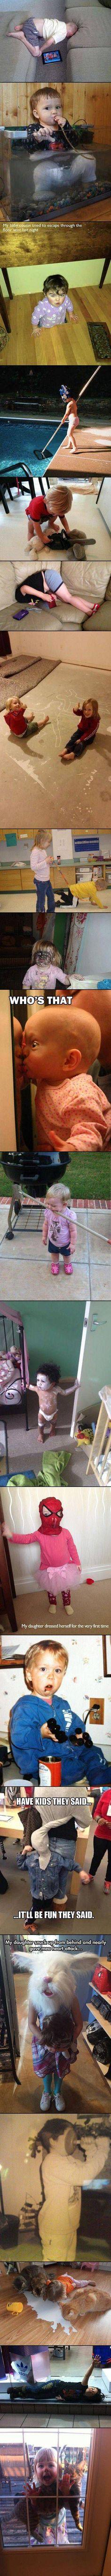 Kids scare me.